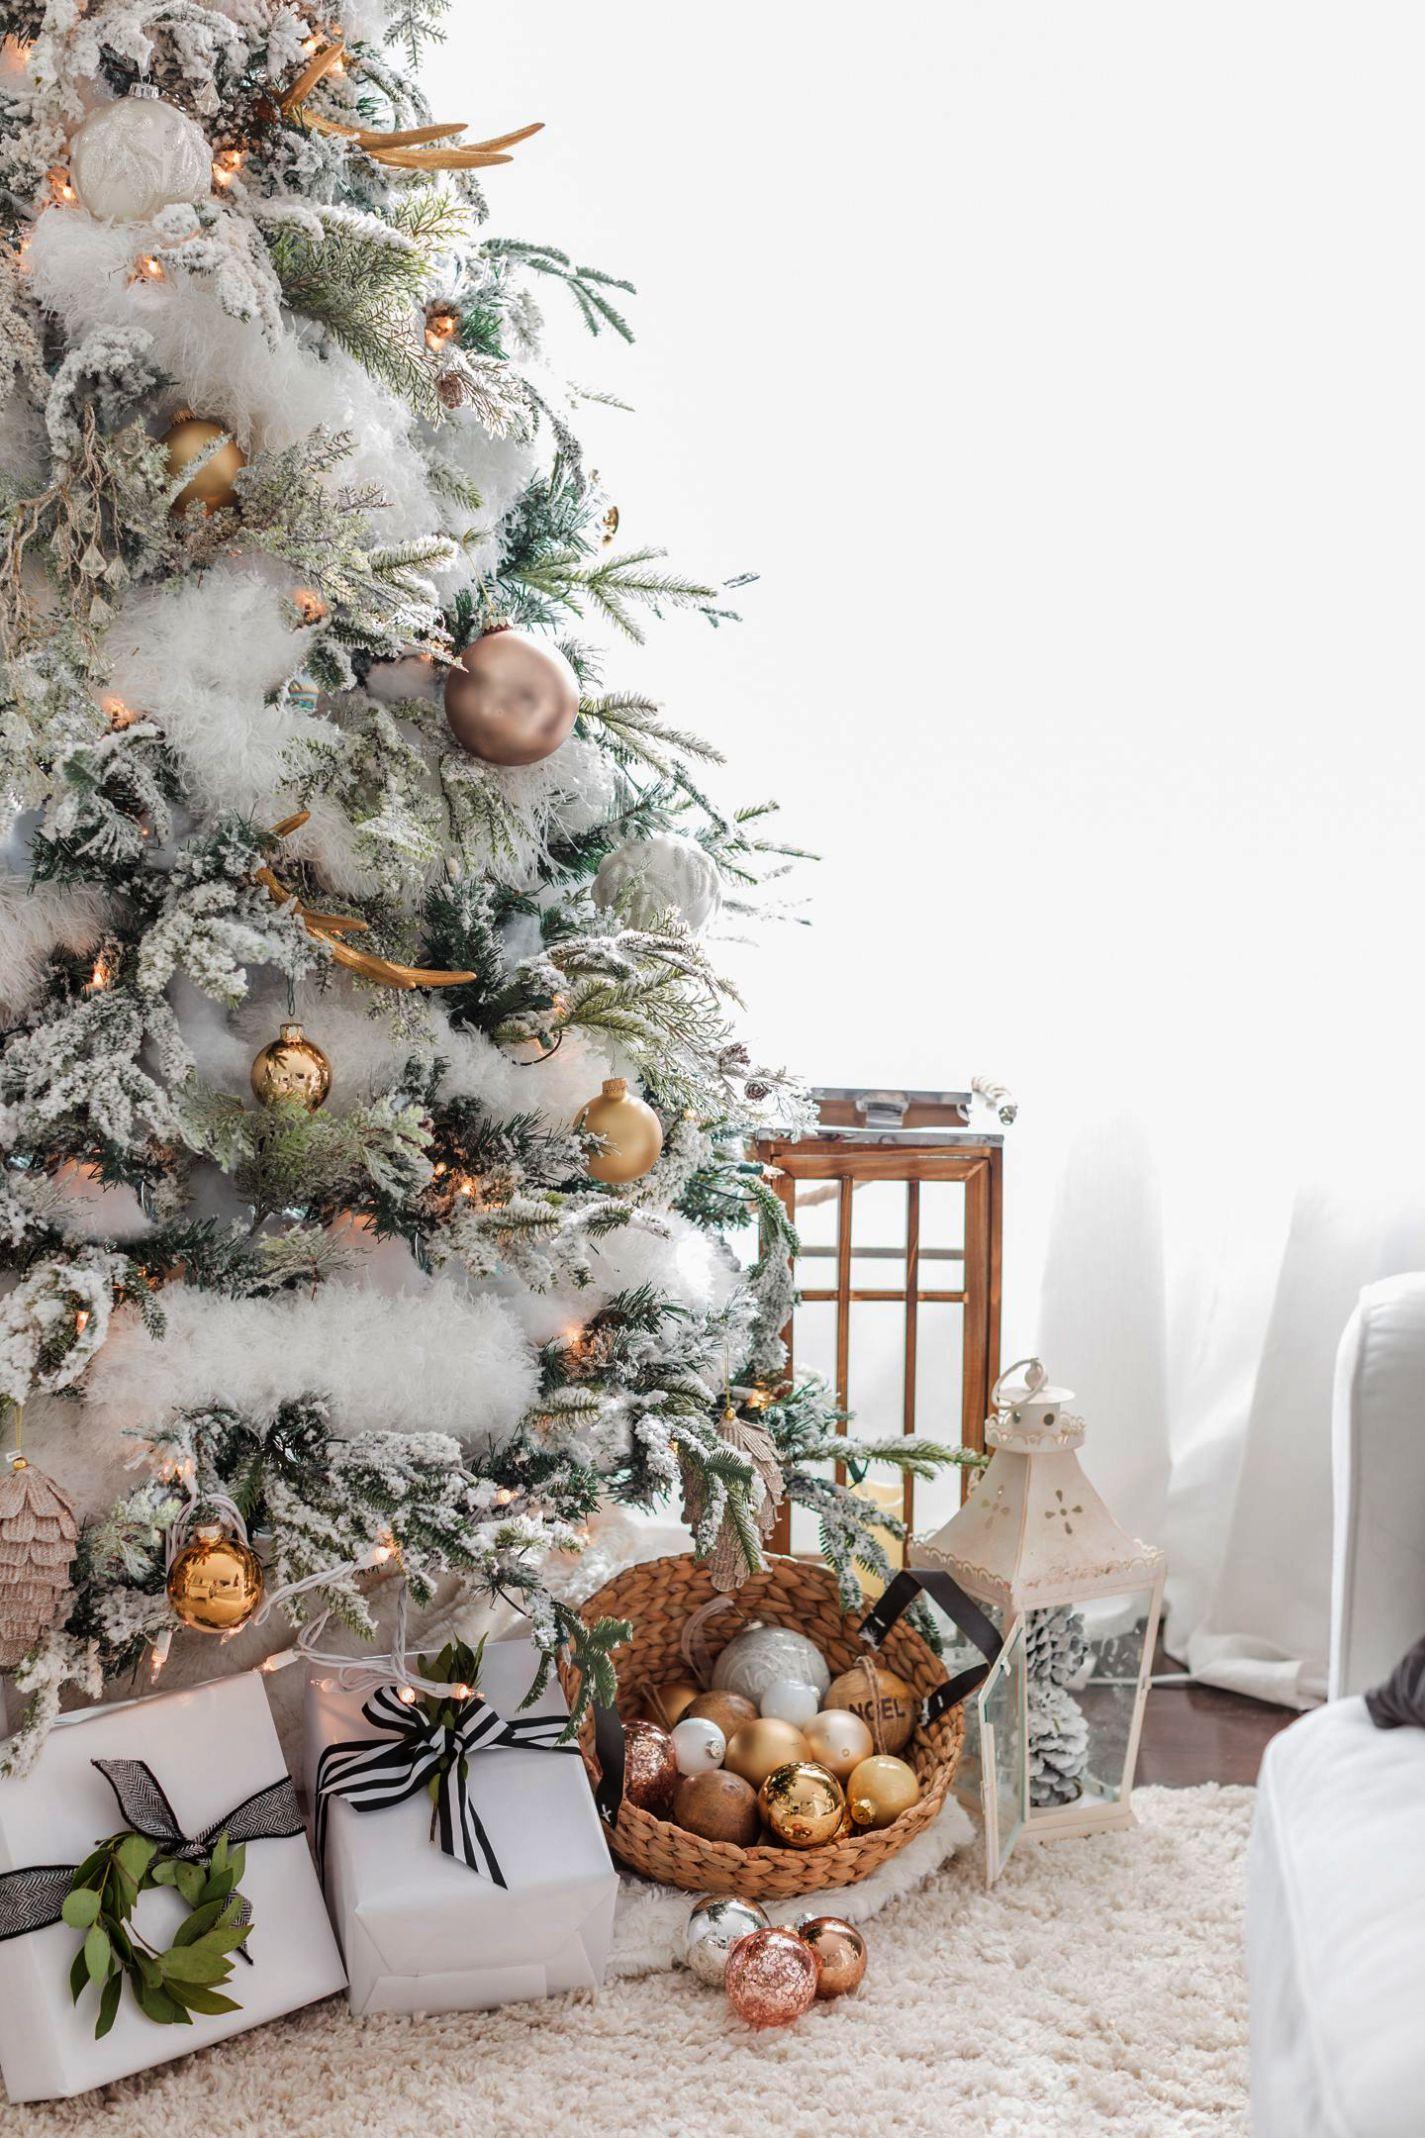 Bucilla Christmas Tree Skirt Kit Candy Express As Christmas Gift Ideas Till Christmas Tr Rose Gold Christmas Flocked Christmas Trees Christmas Tree Decorations